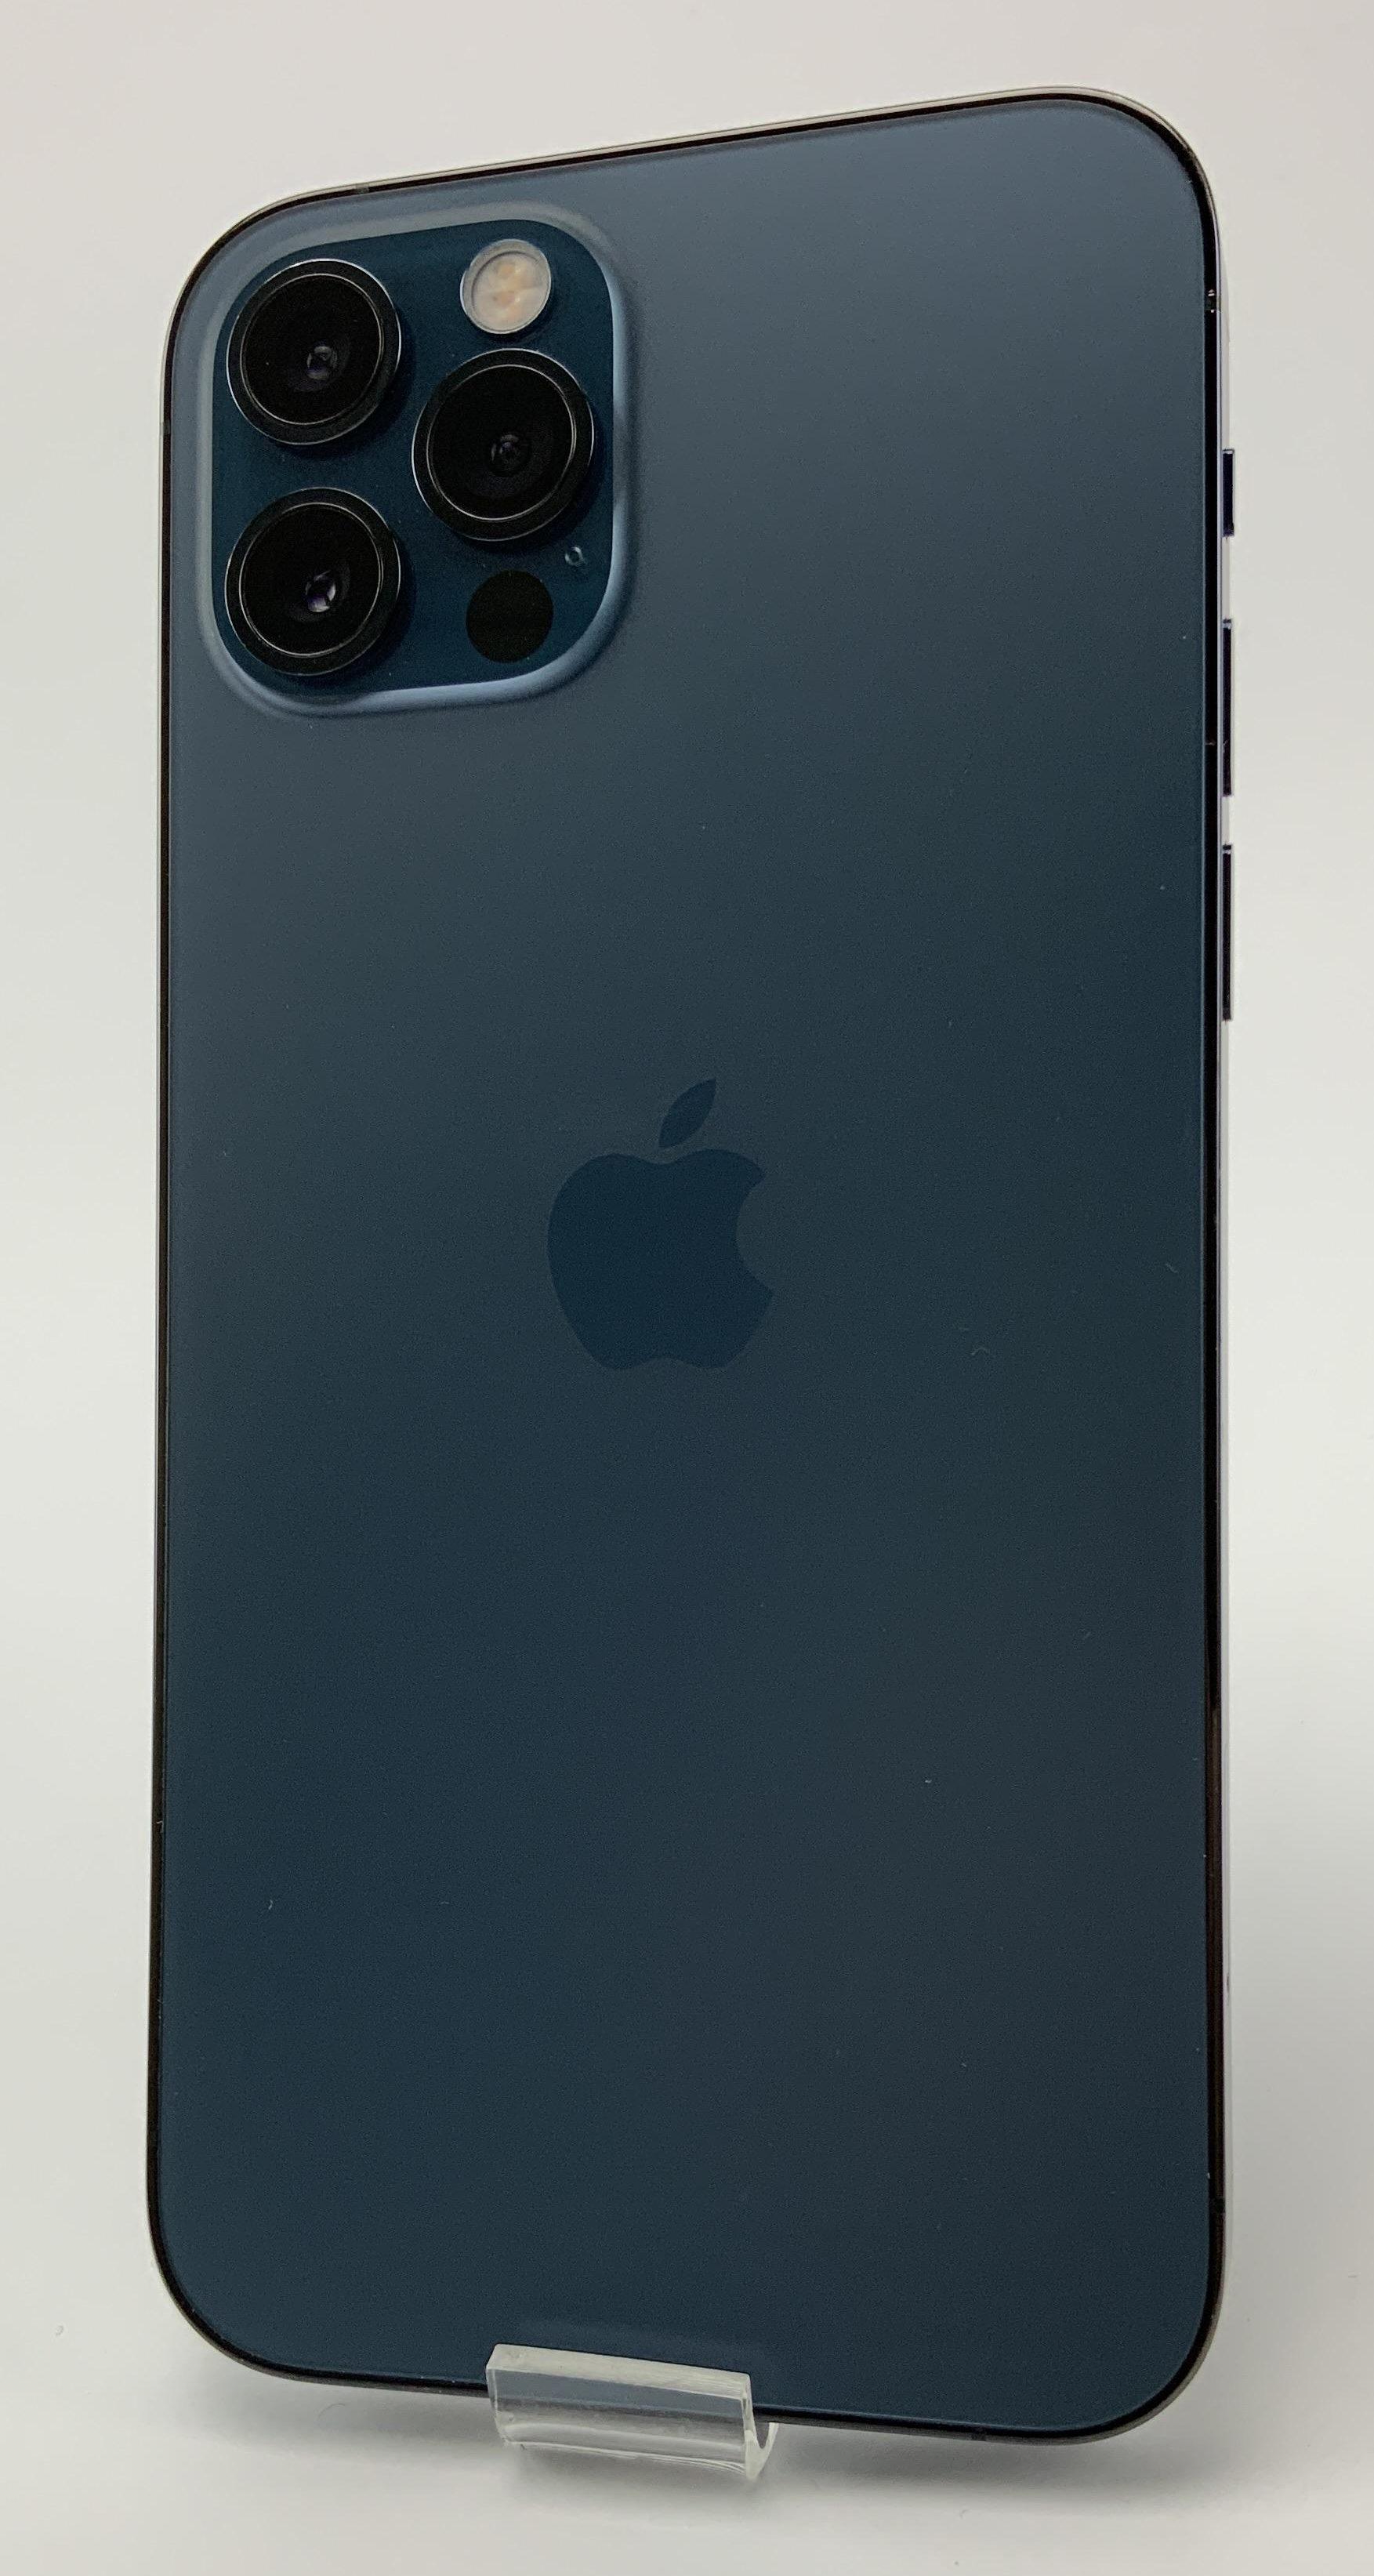 iPhone 12 Pro 128GB, 128GB, Pacific Blue, bild 2